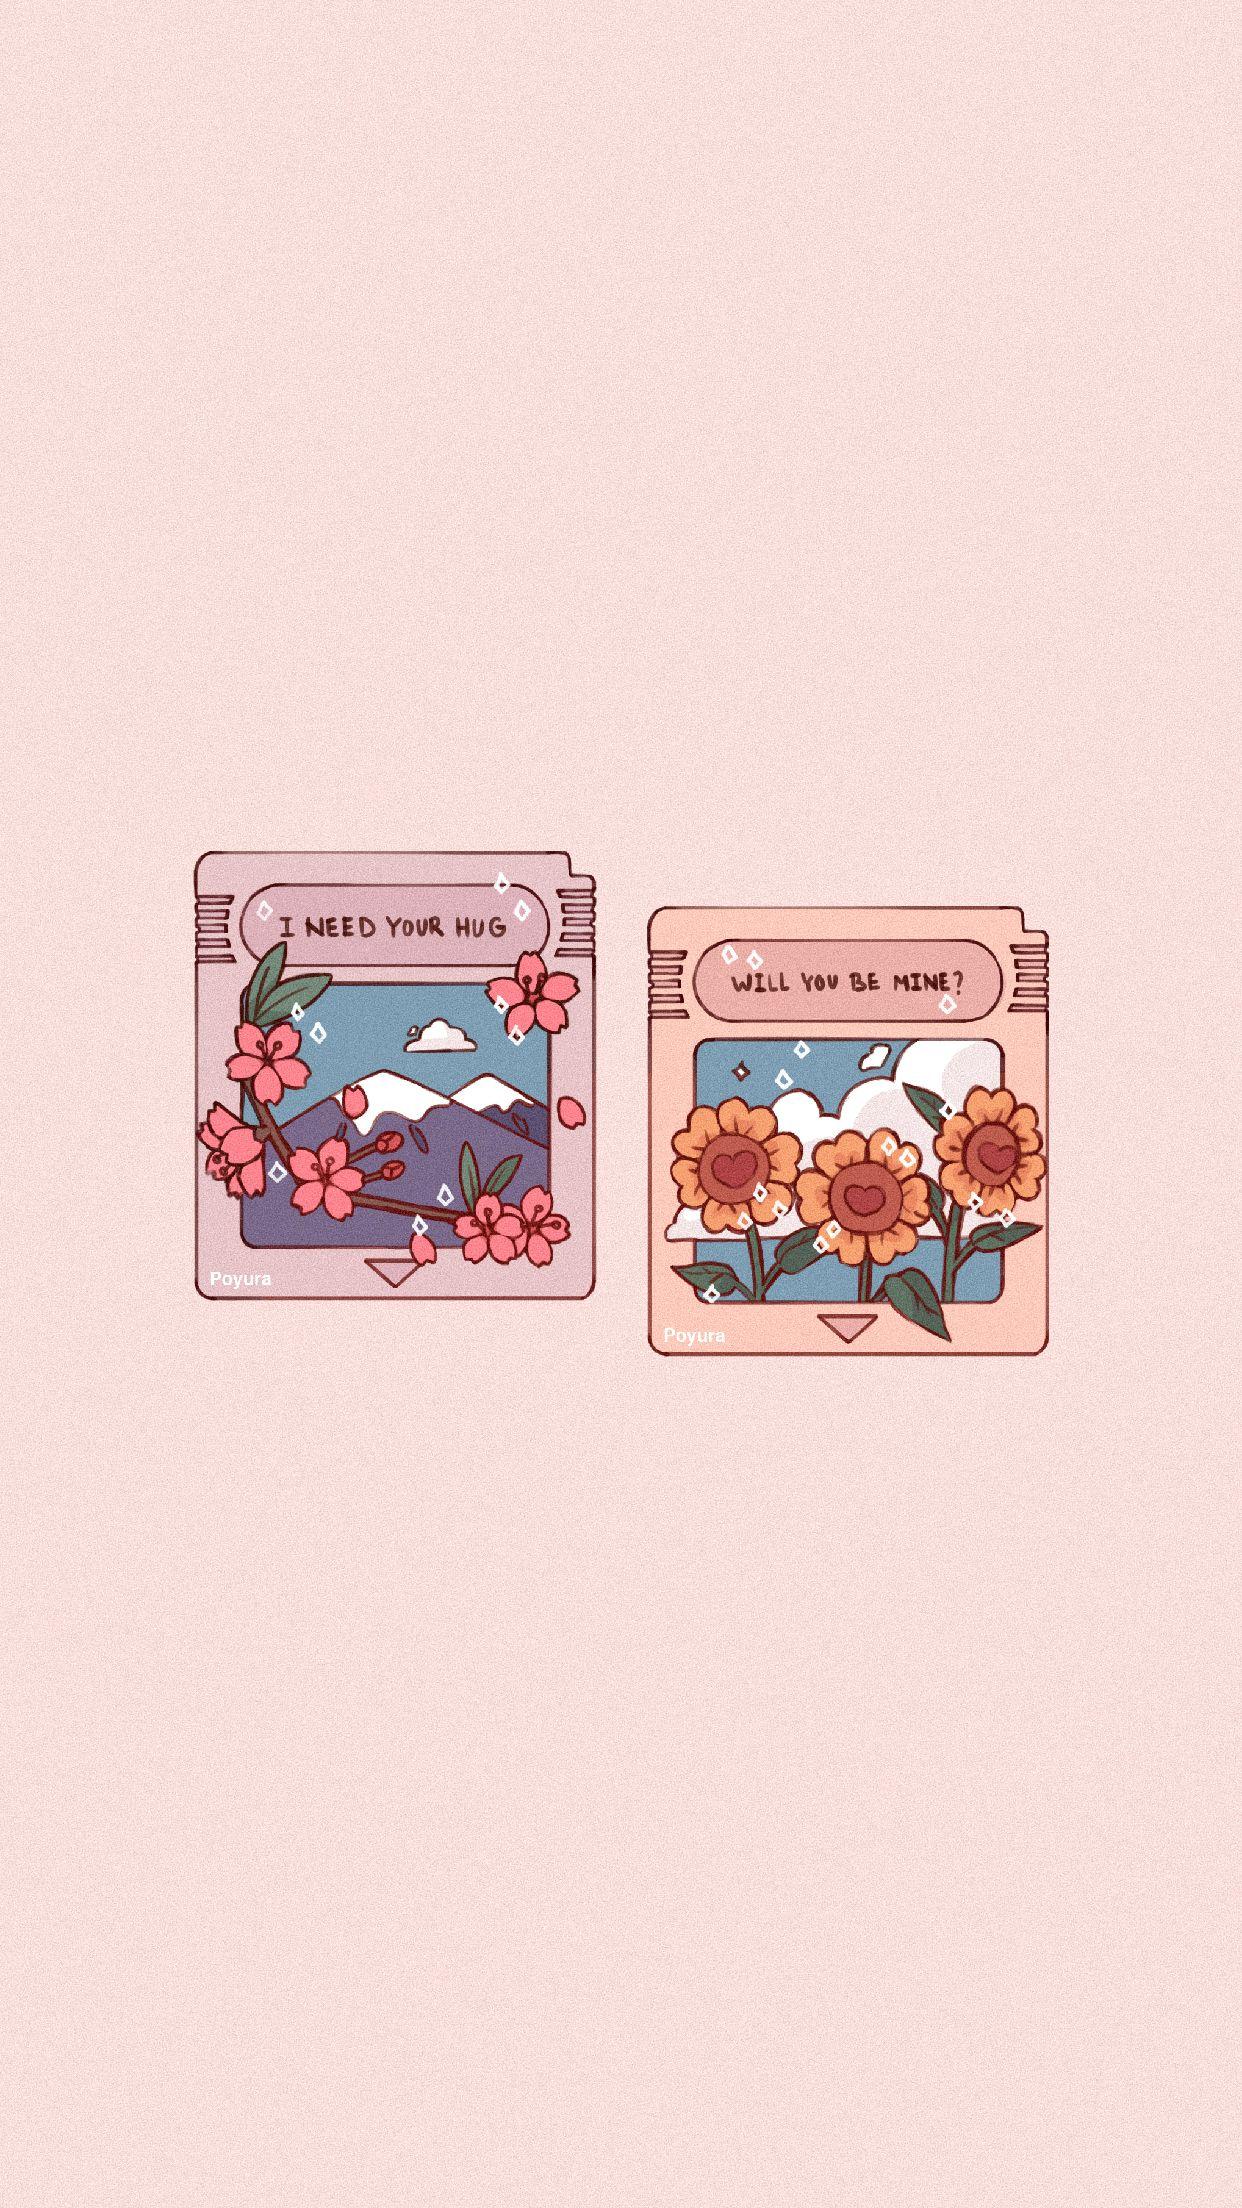 Aesthetic Flower Plant Game Sticker   Kawaii Sunflower 1242x2208